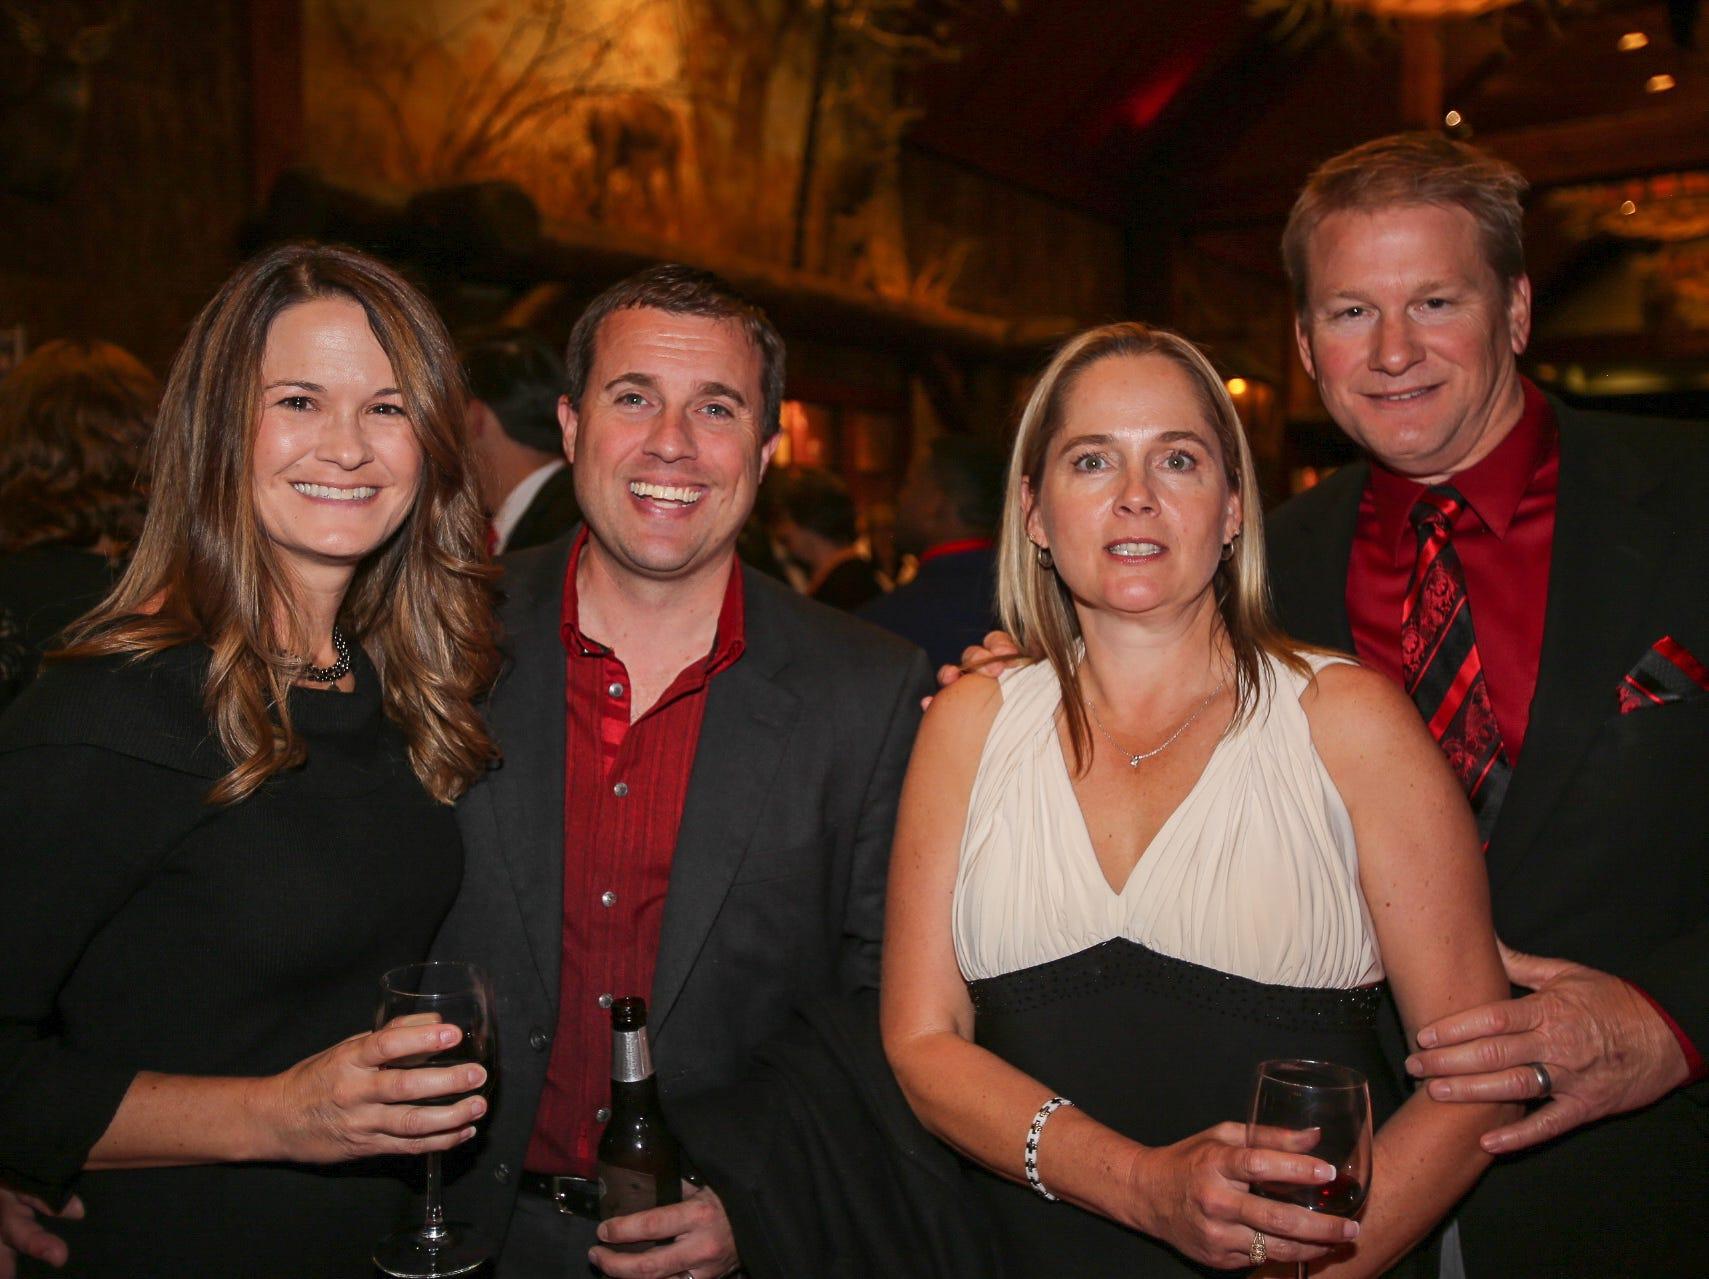 Melinda and Irick Thurman, Jo and Jeremy Macdonnell